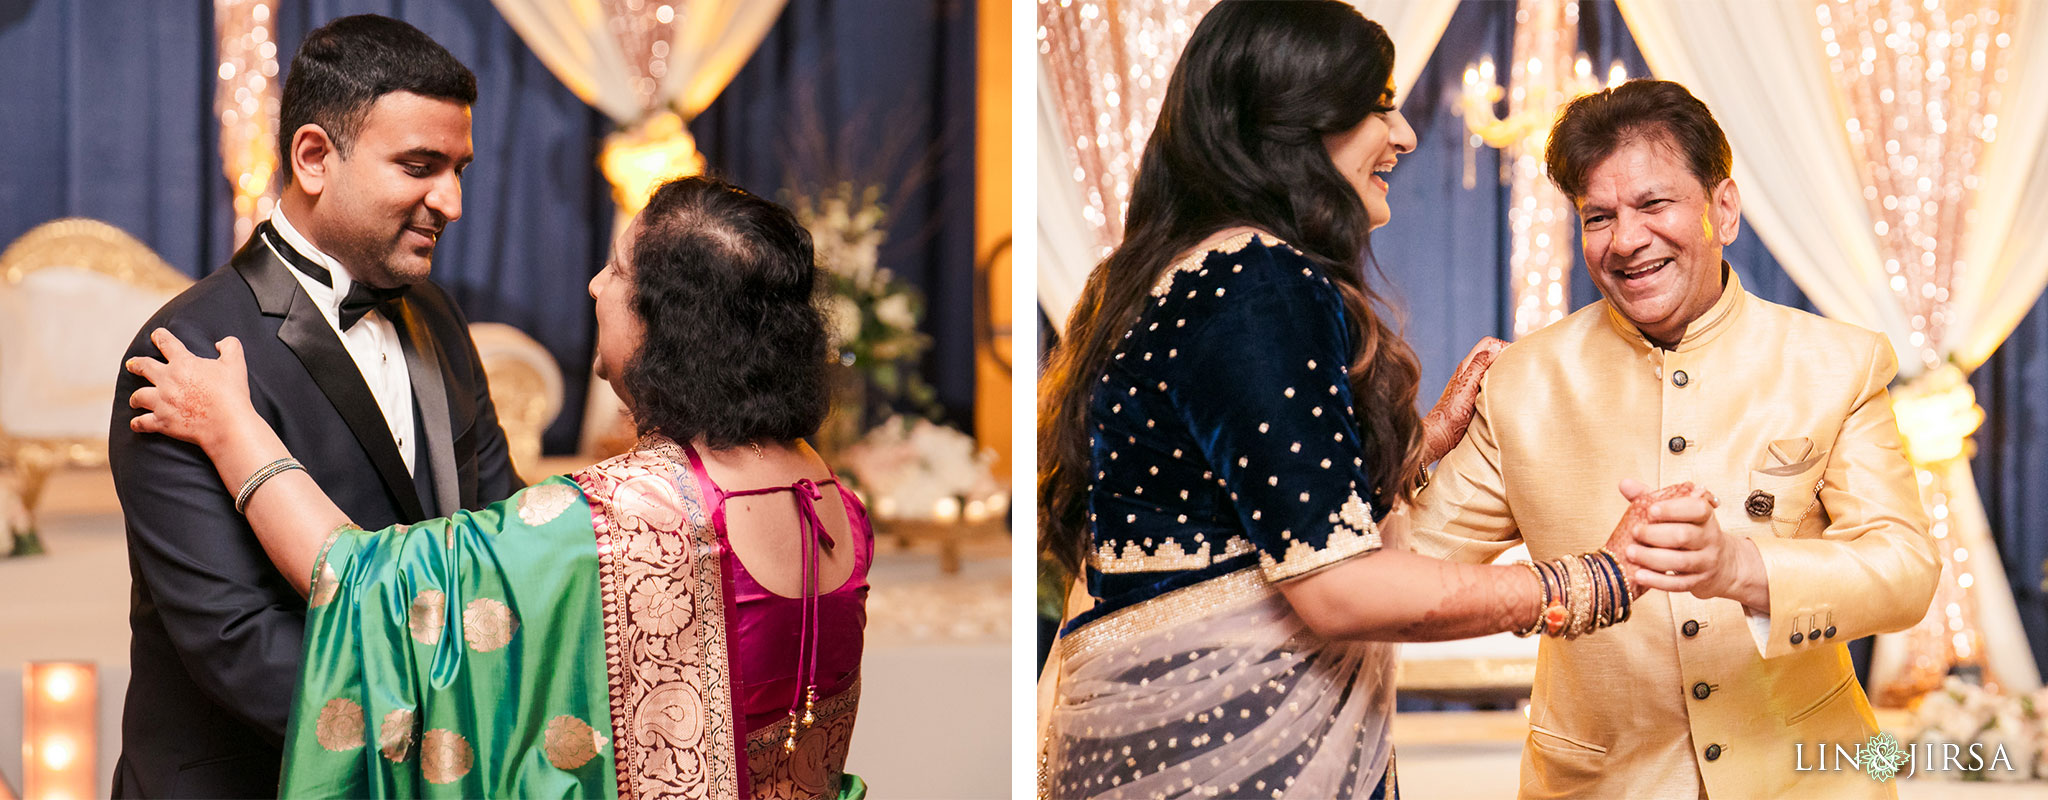 42 sheraton carlsbad resort indian wedding photography